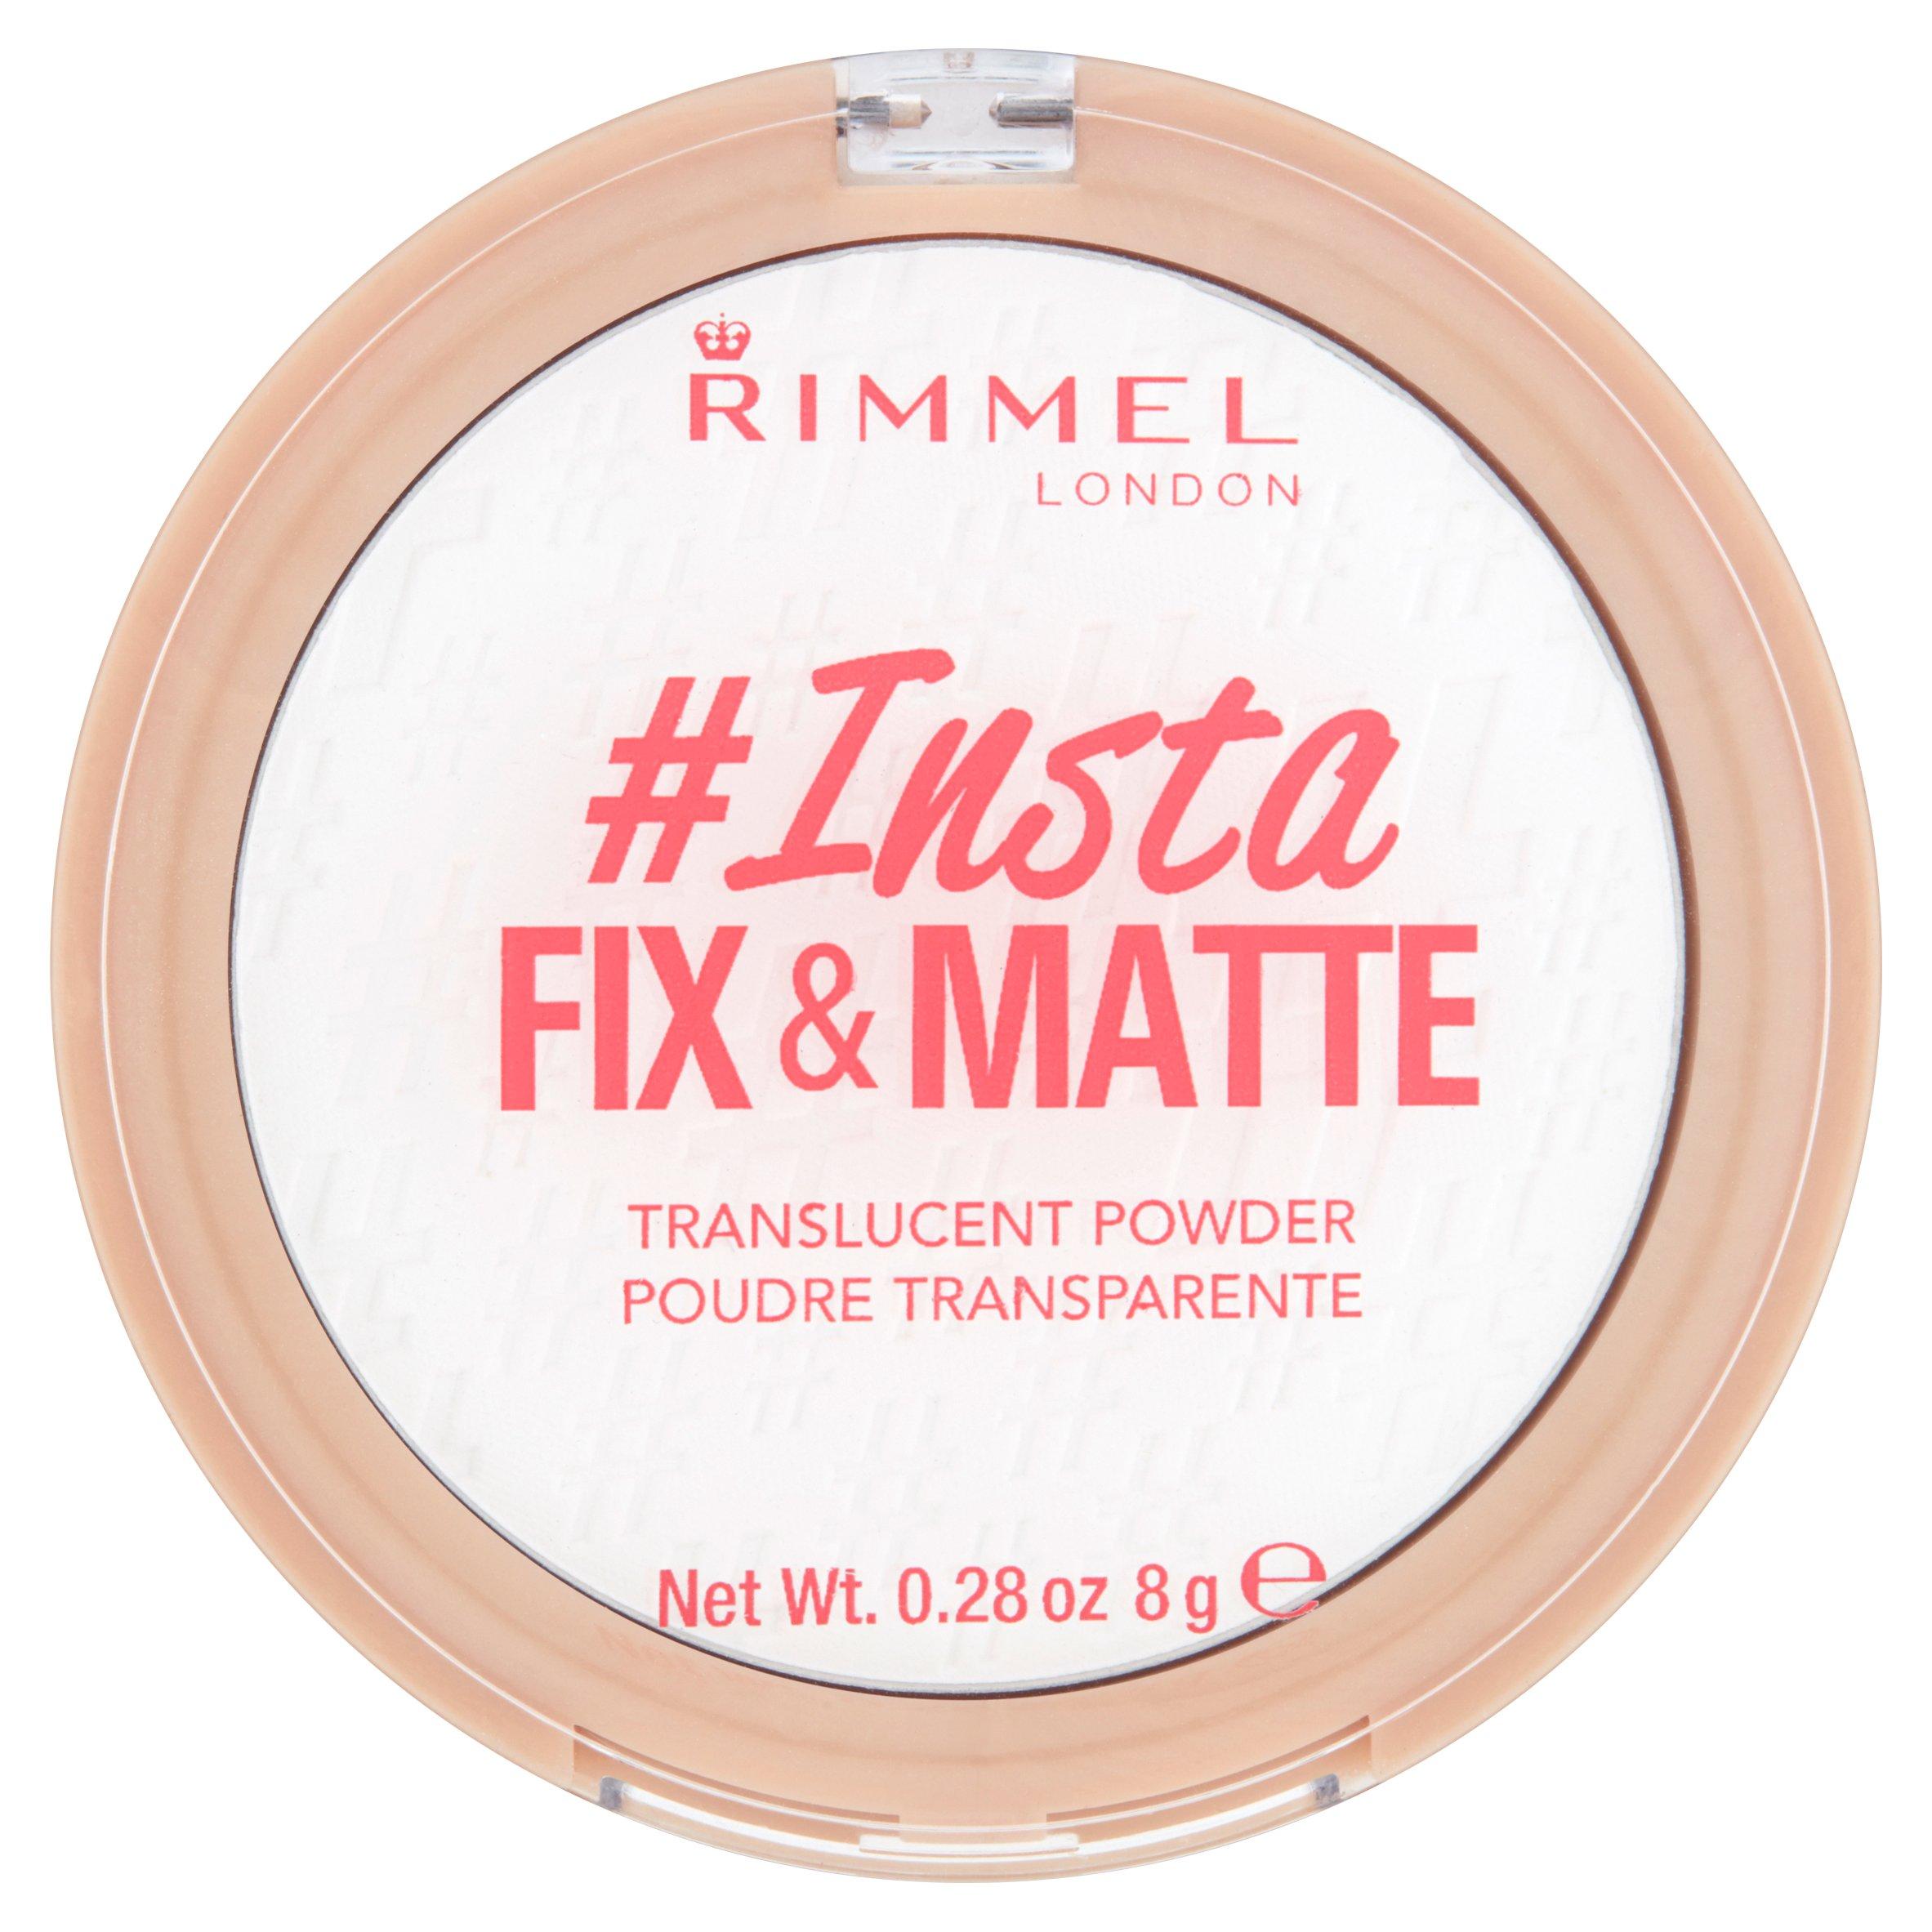 Rimmel London Insta Fix & Matte Translucent Powder $1.00 with pickup savings at walmart